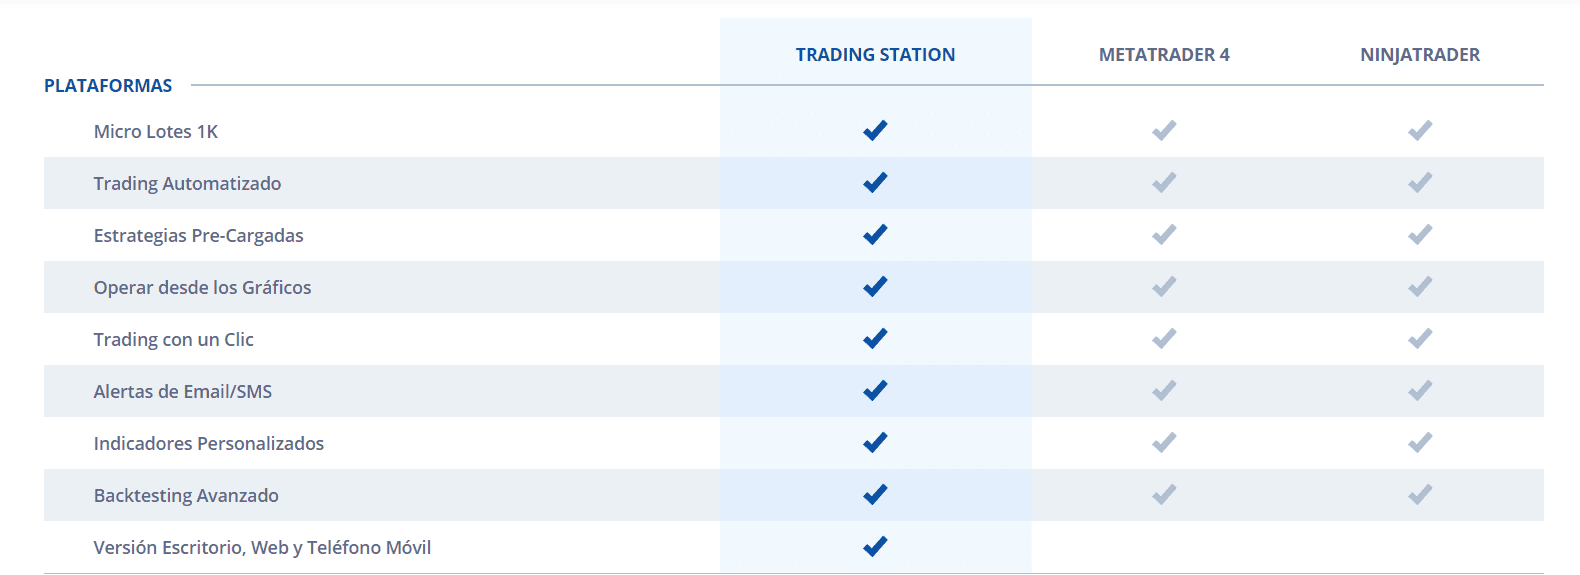 Comparativa plataformas fxcm